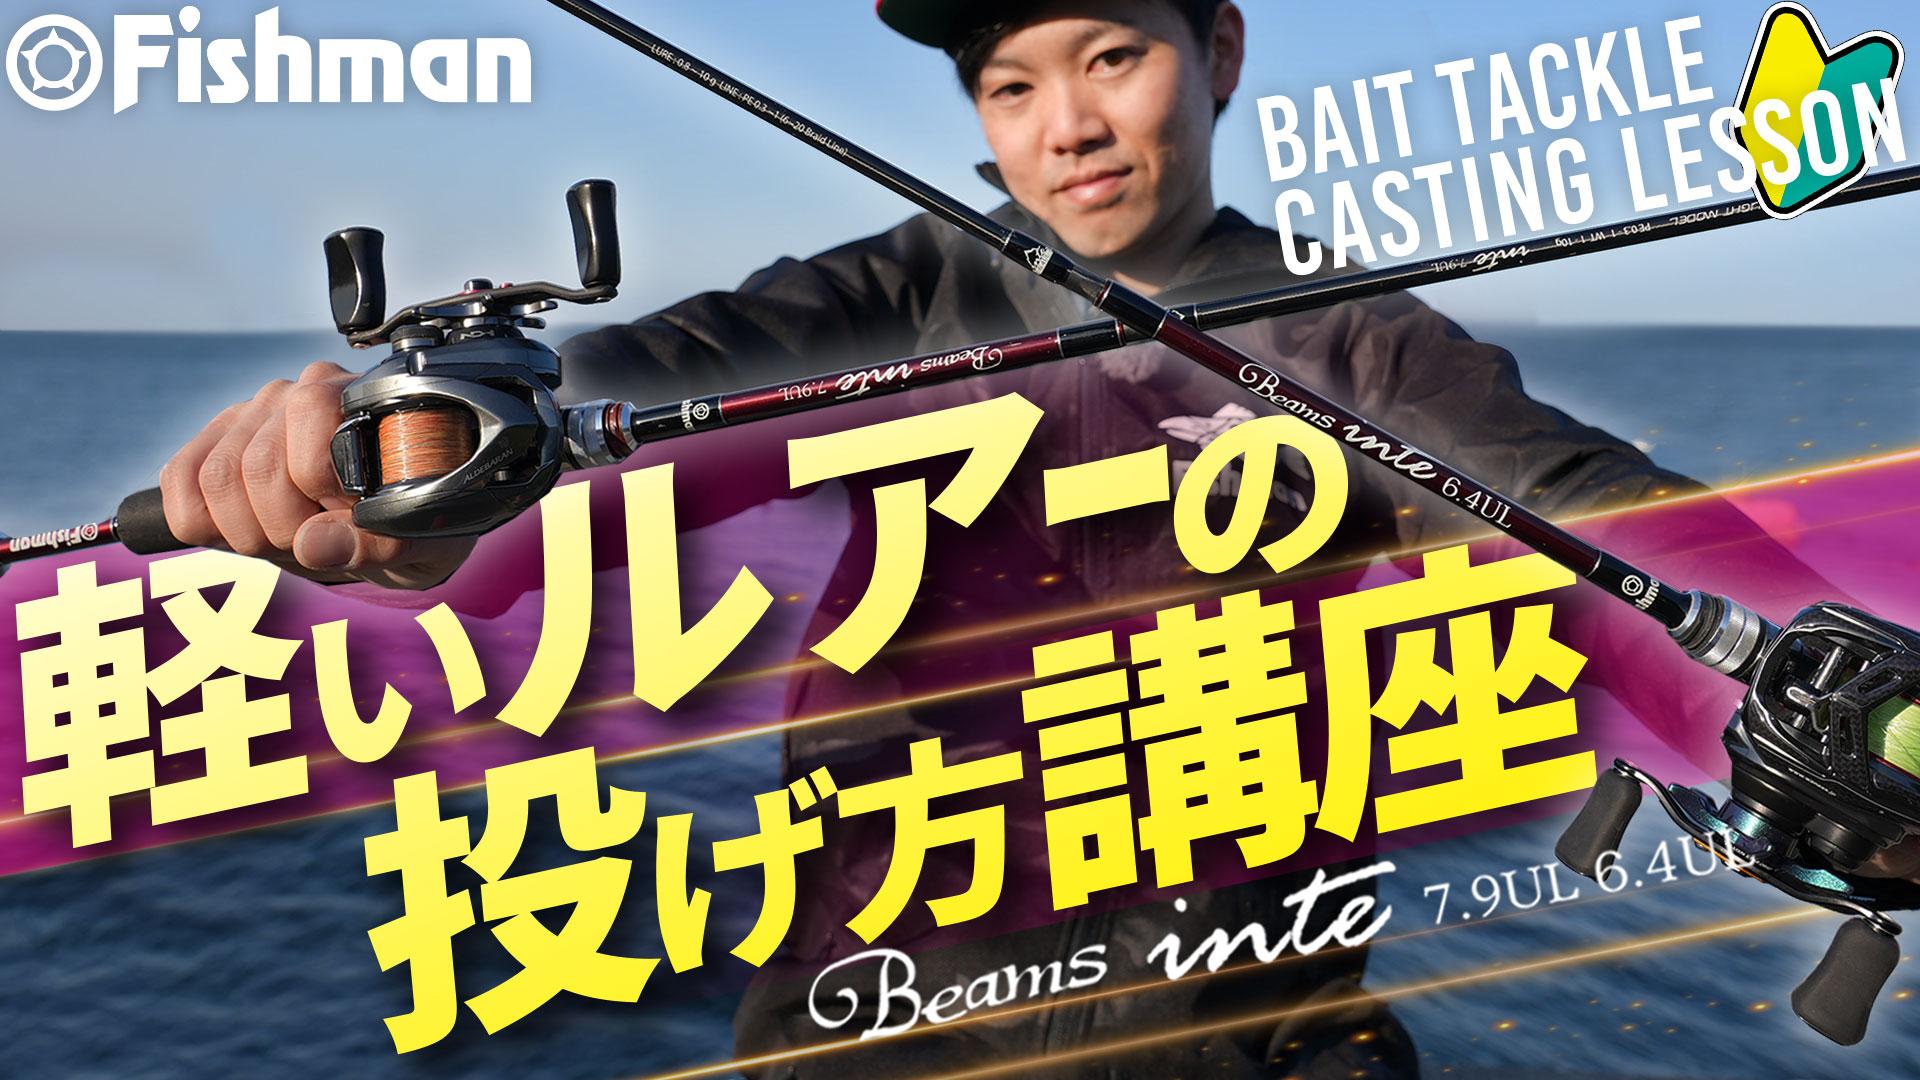 FishmanTV新作公開 【初心者必見!】軽いルアーの投げ方講座